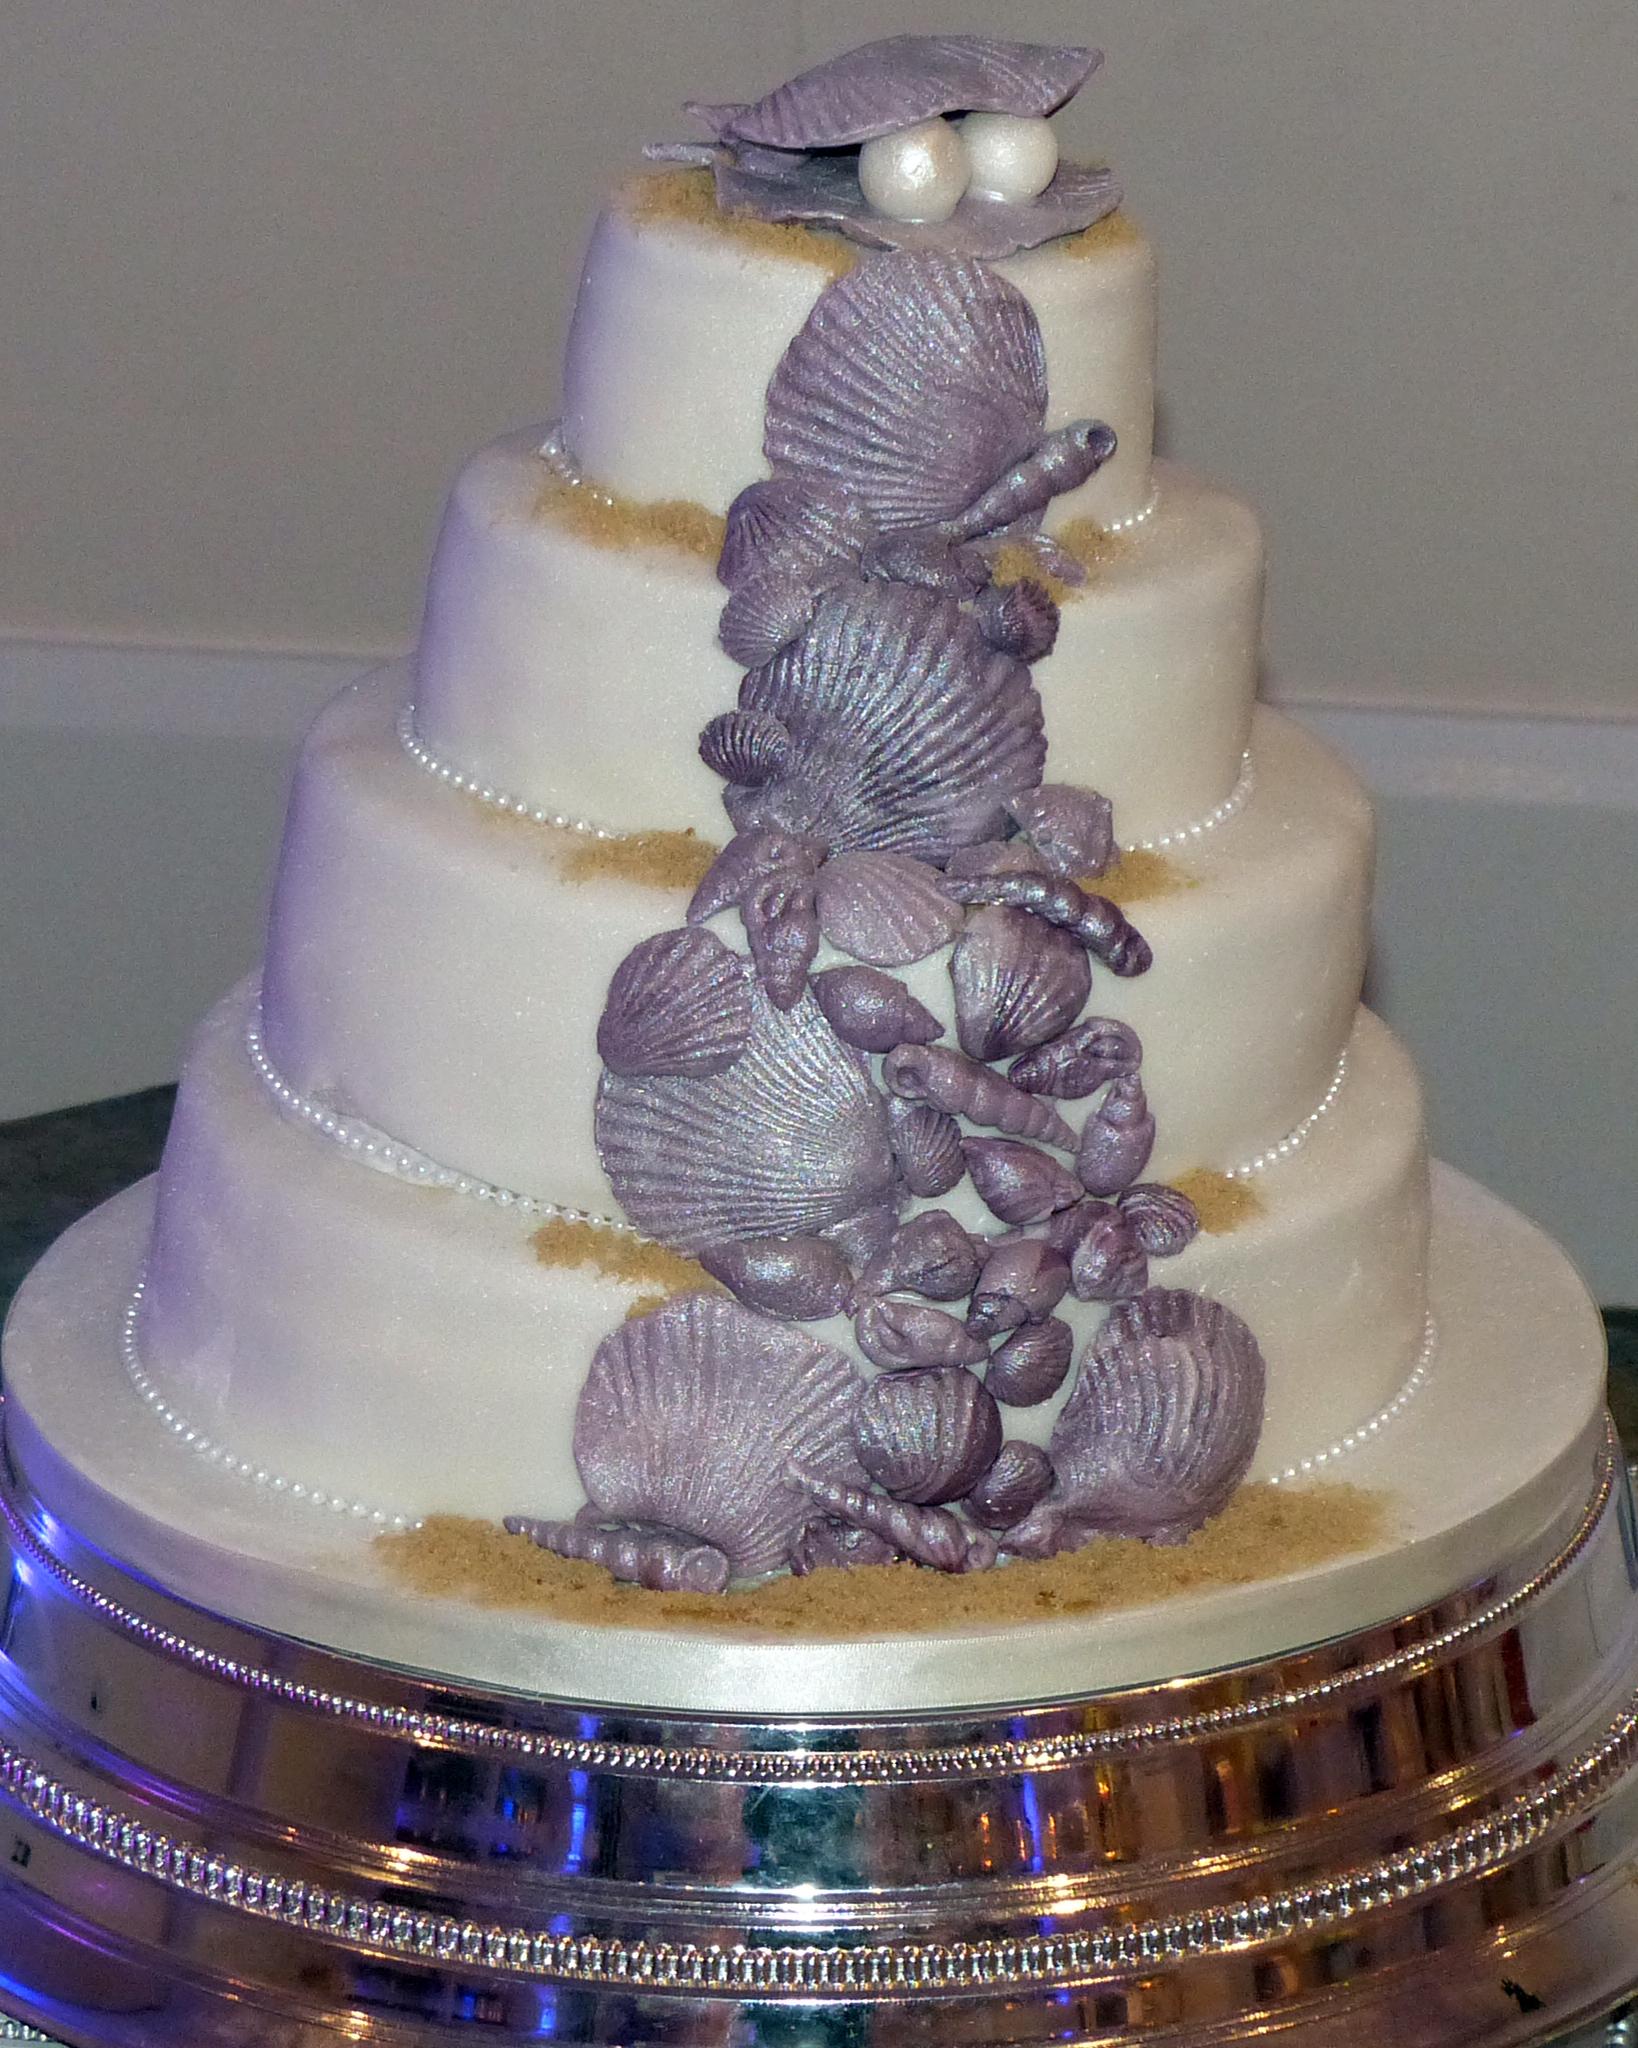 The Cake_001